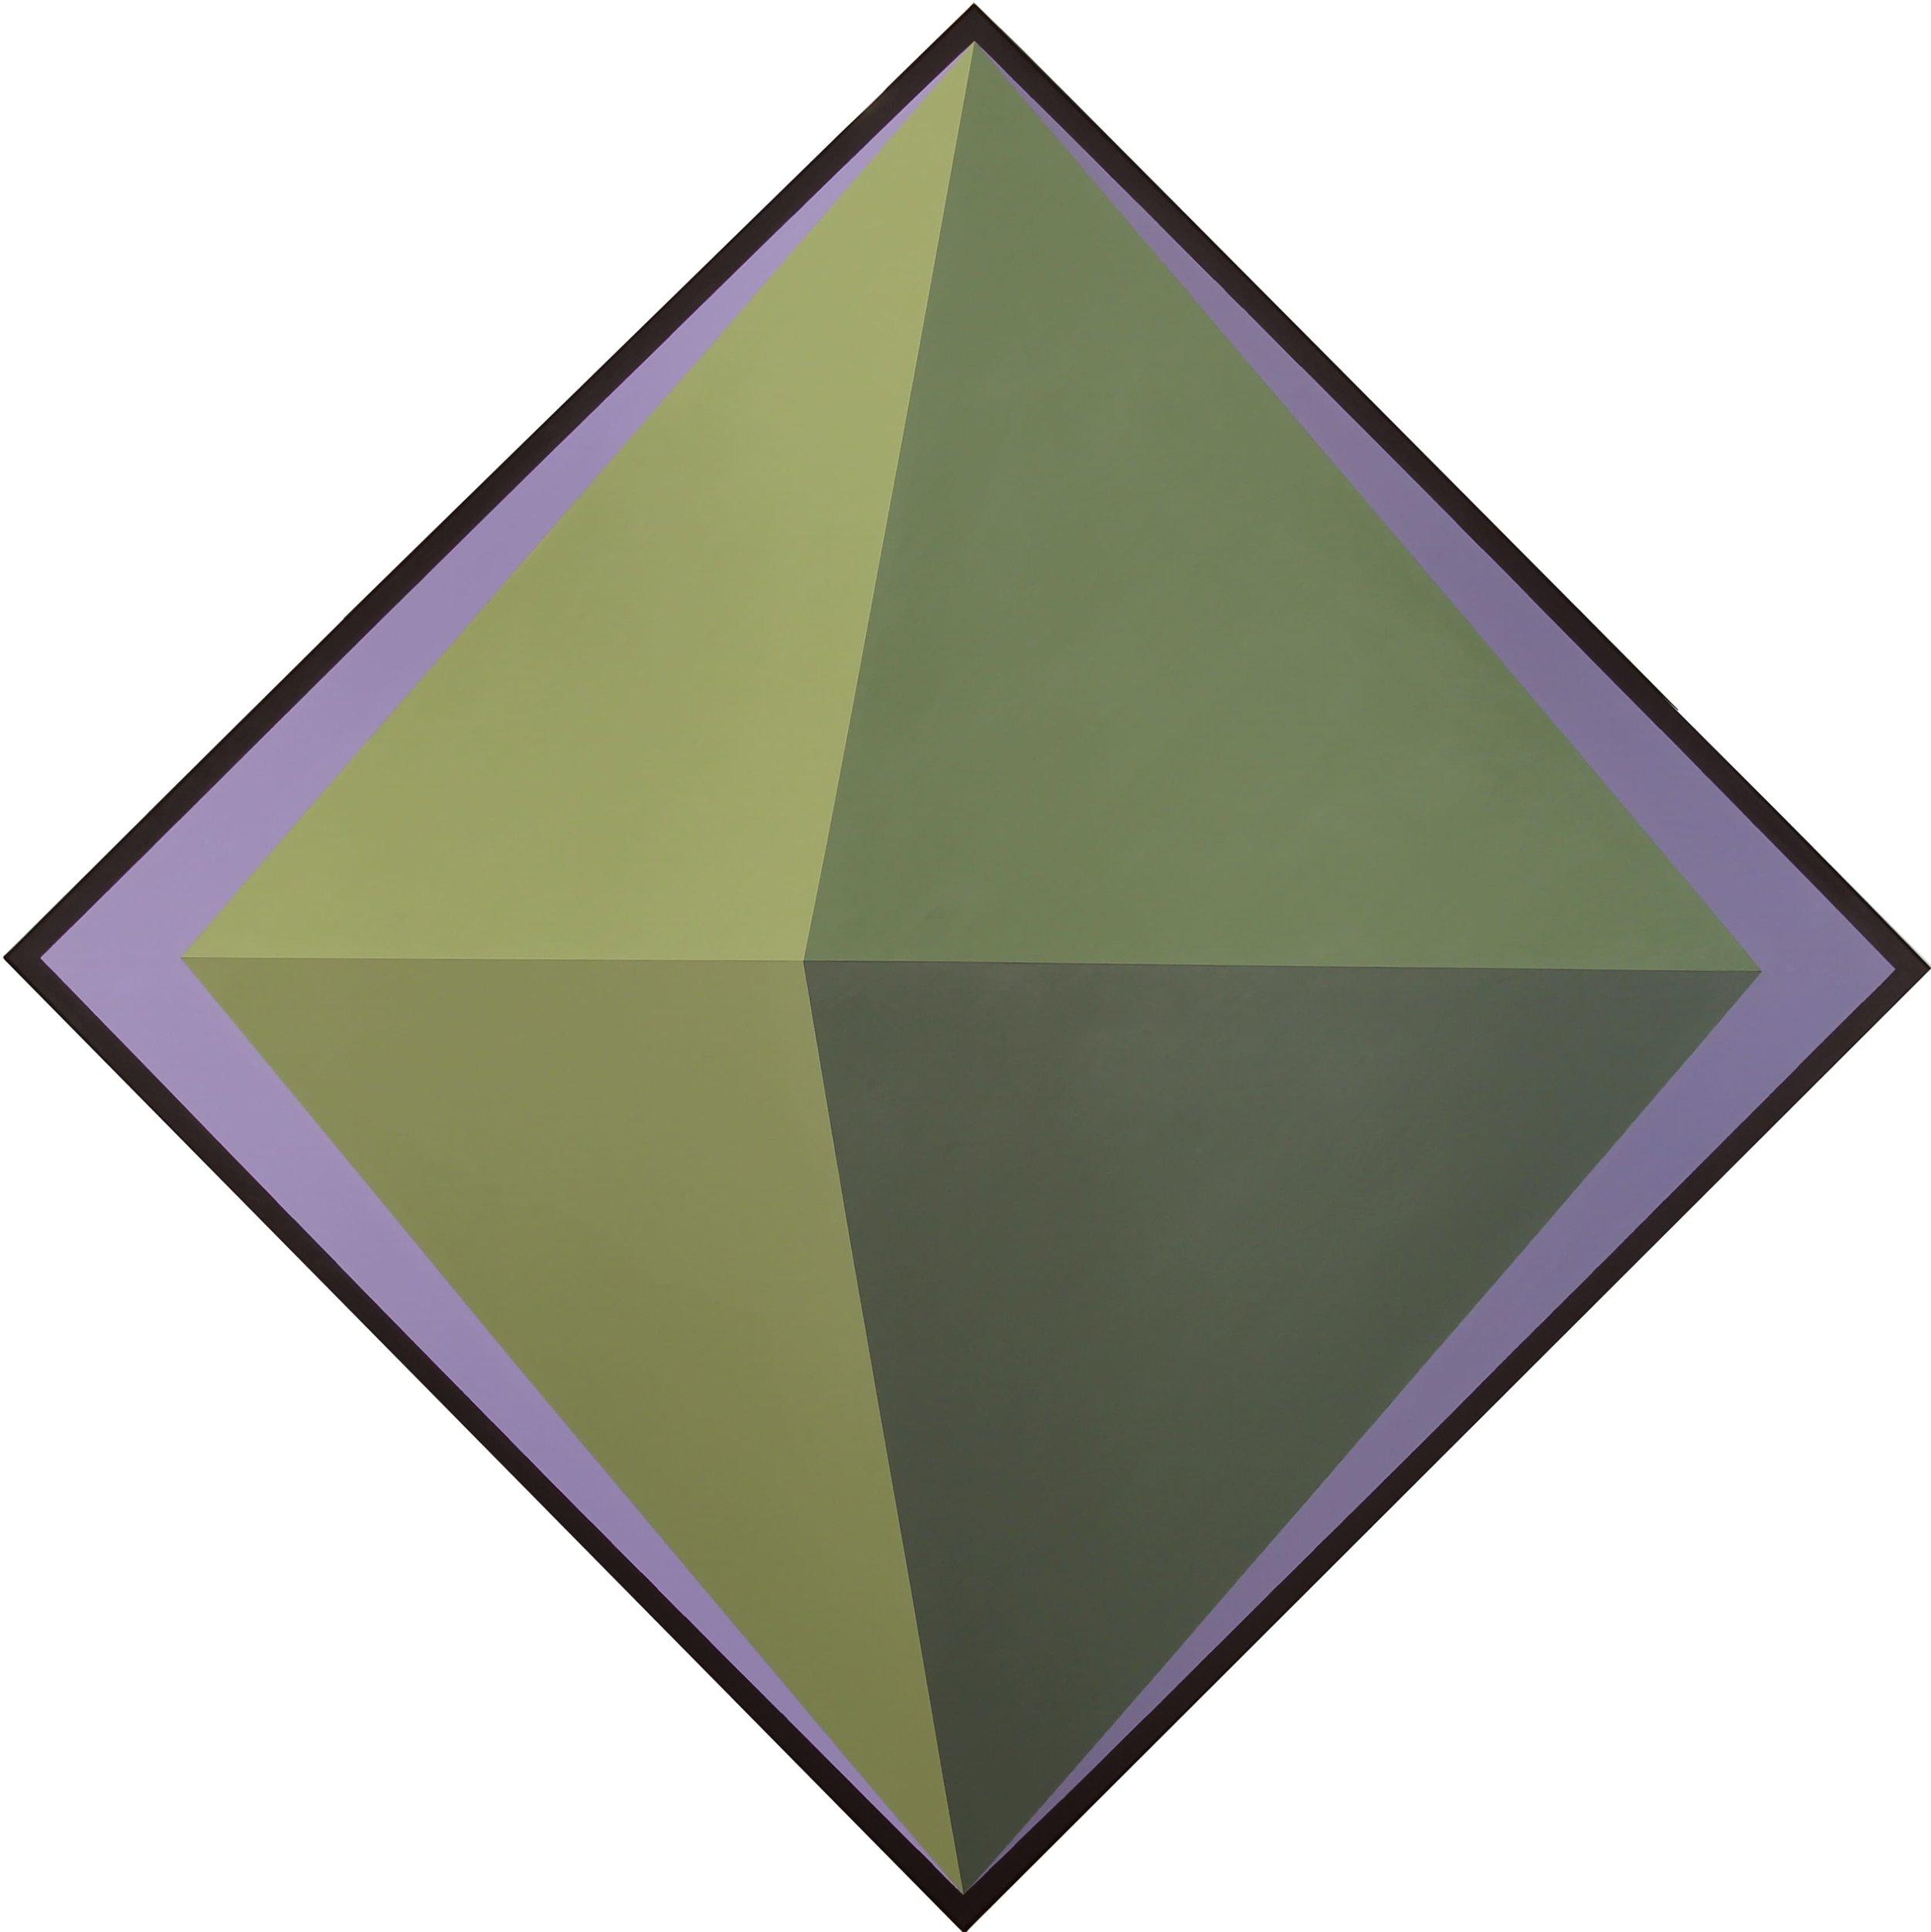 The Green Octahedron, Acrylic Paint on Canvas, 2019